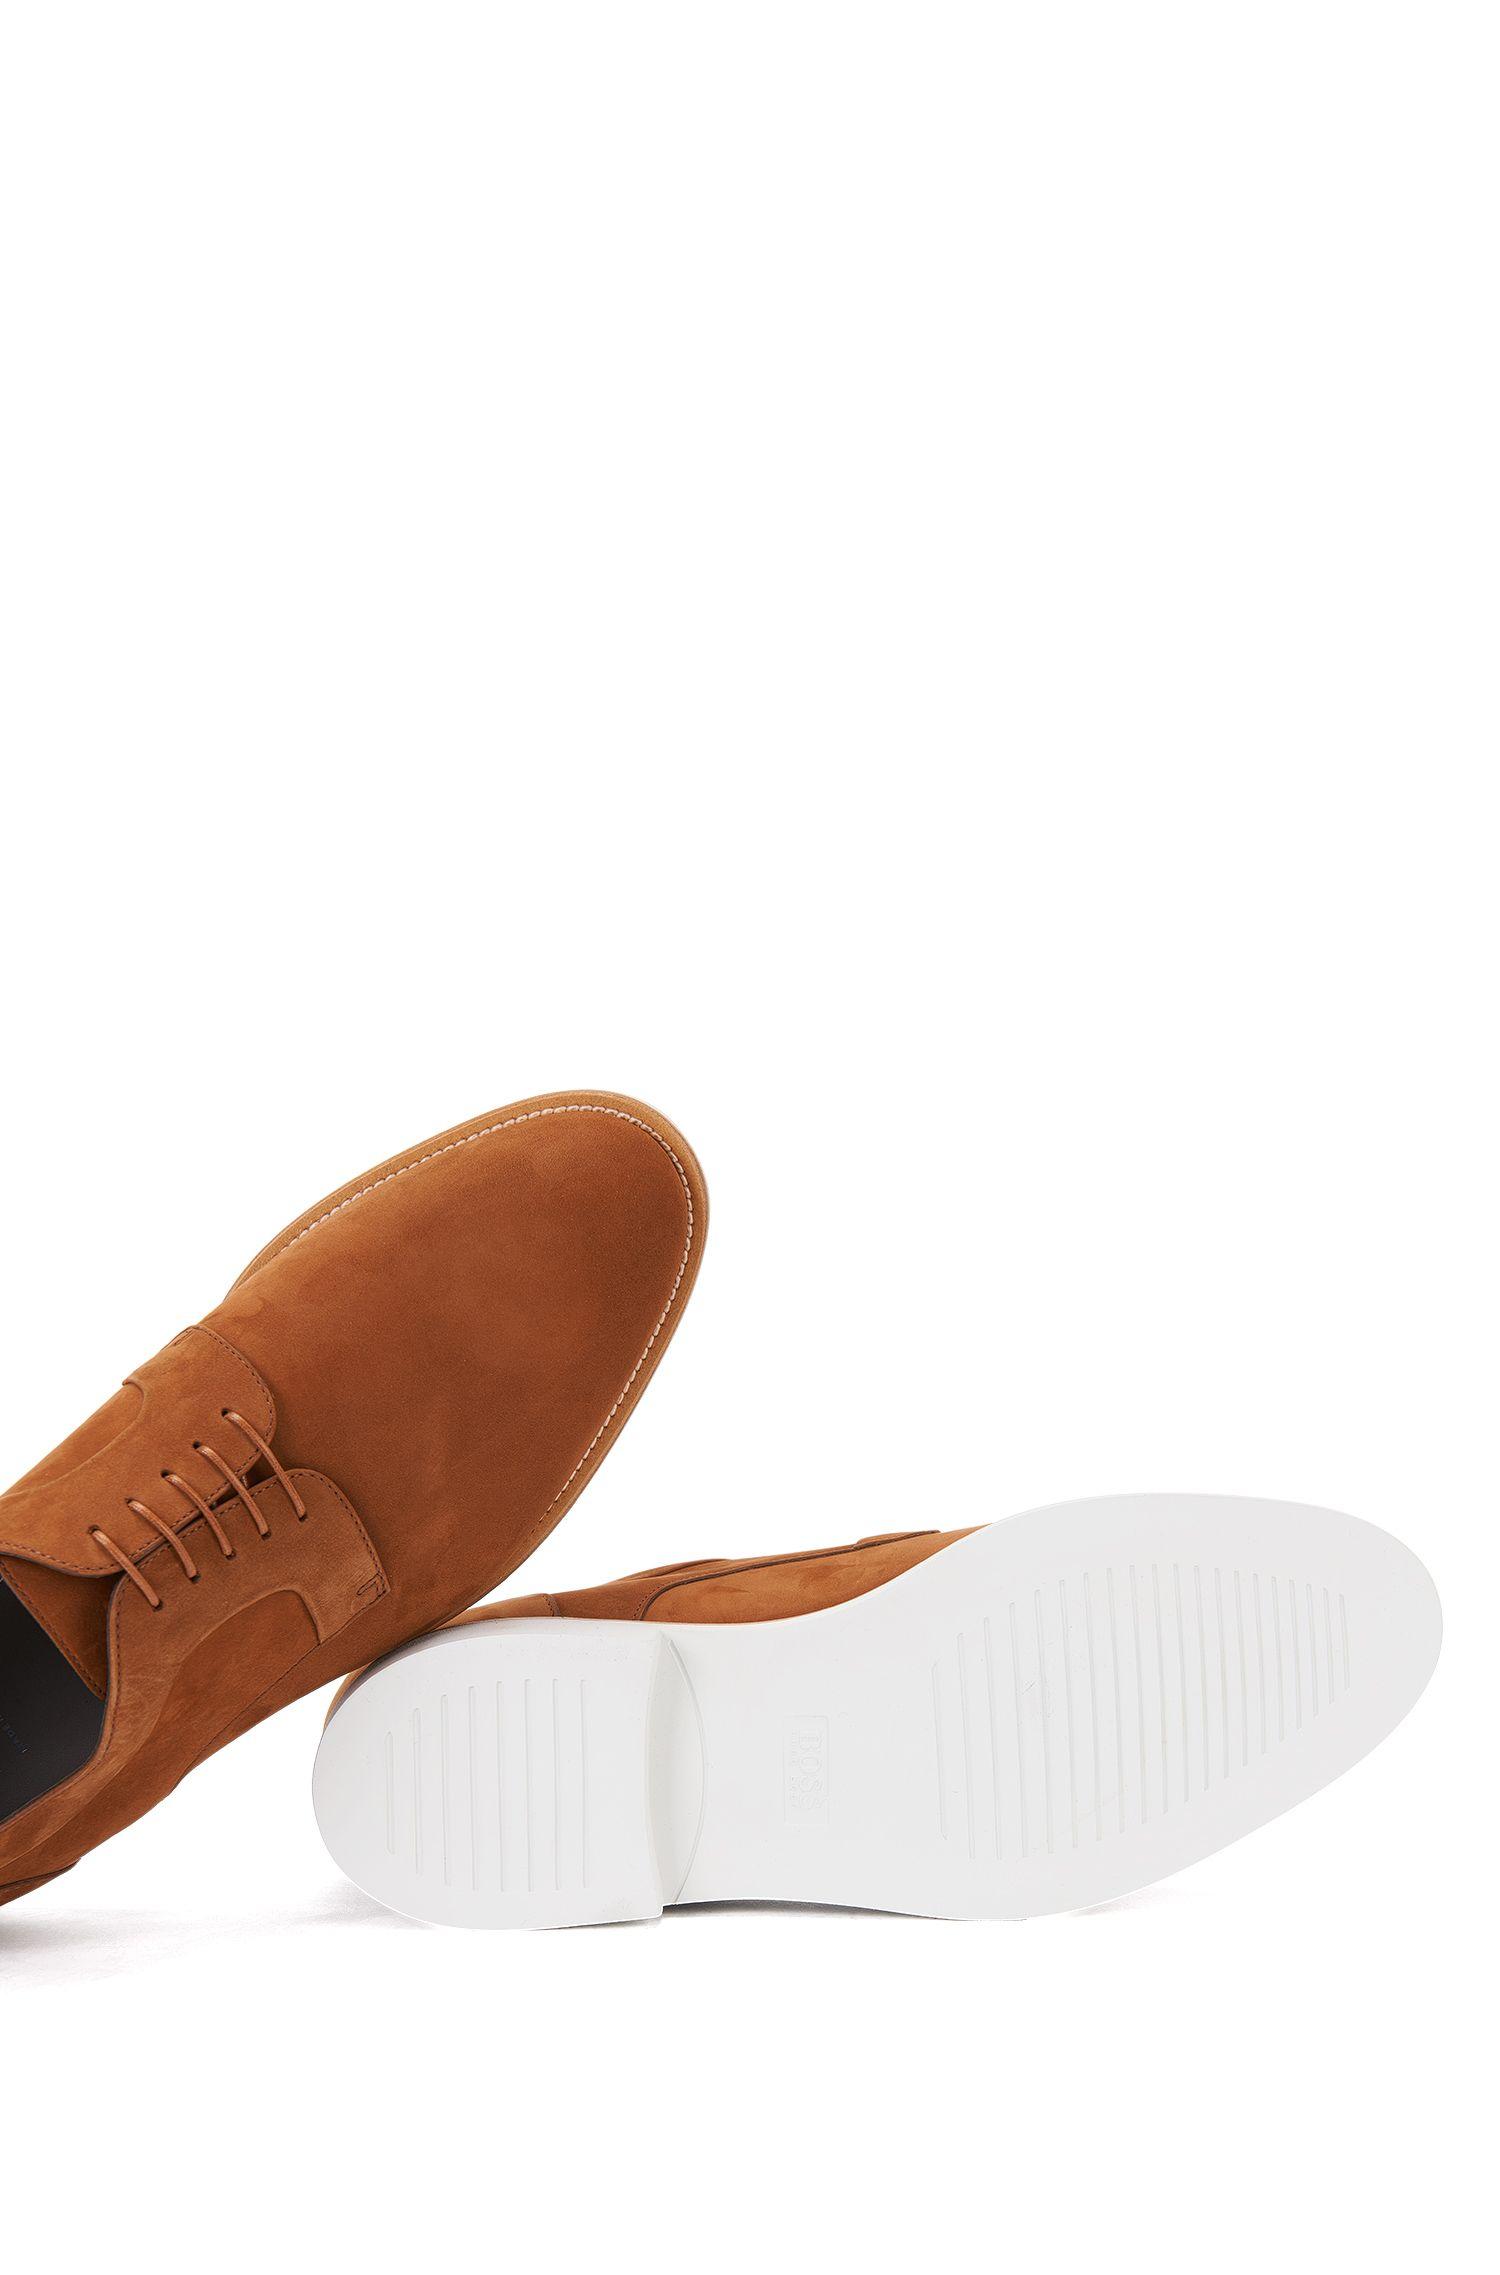 Italian Nubuck Derby Shoe   Ocean Derb Nu